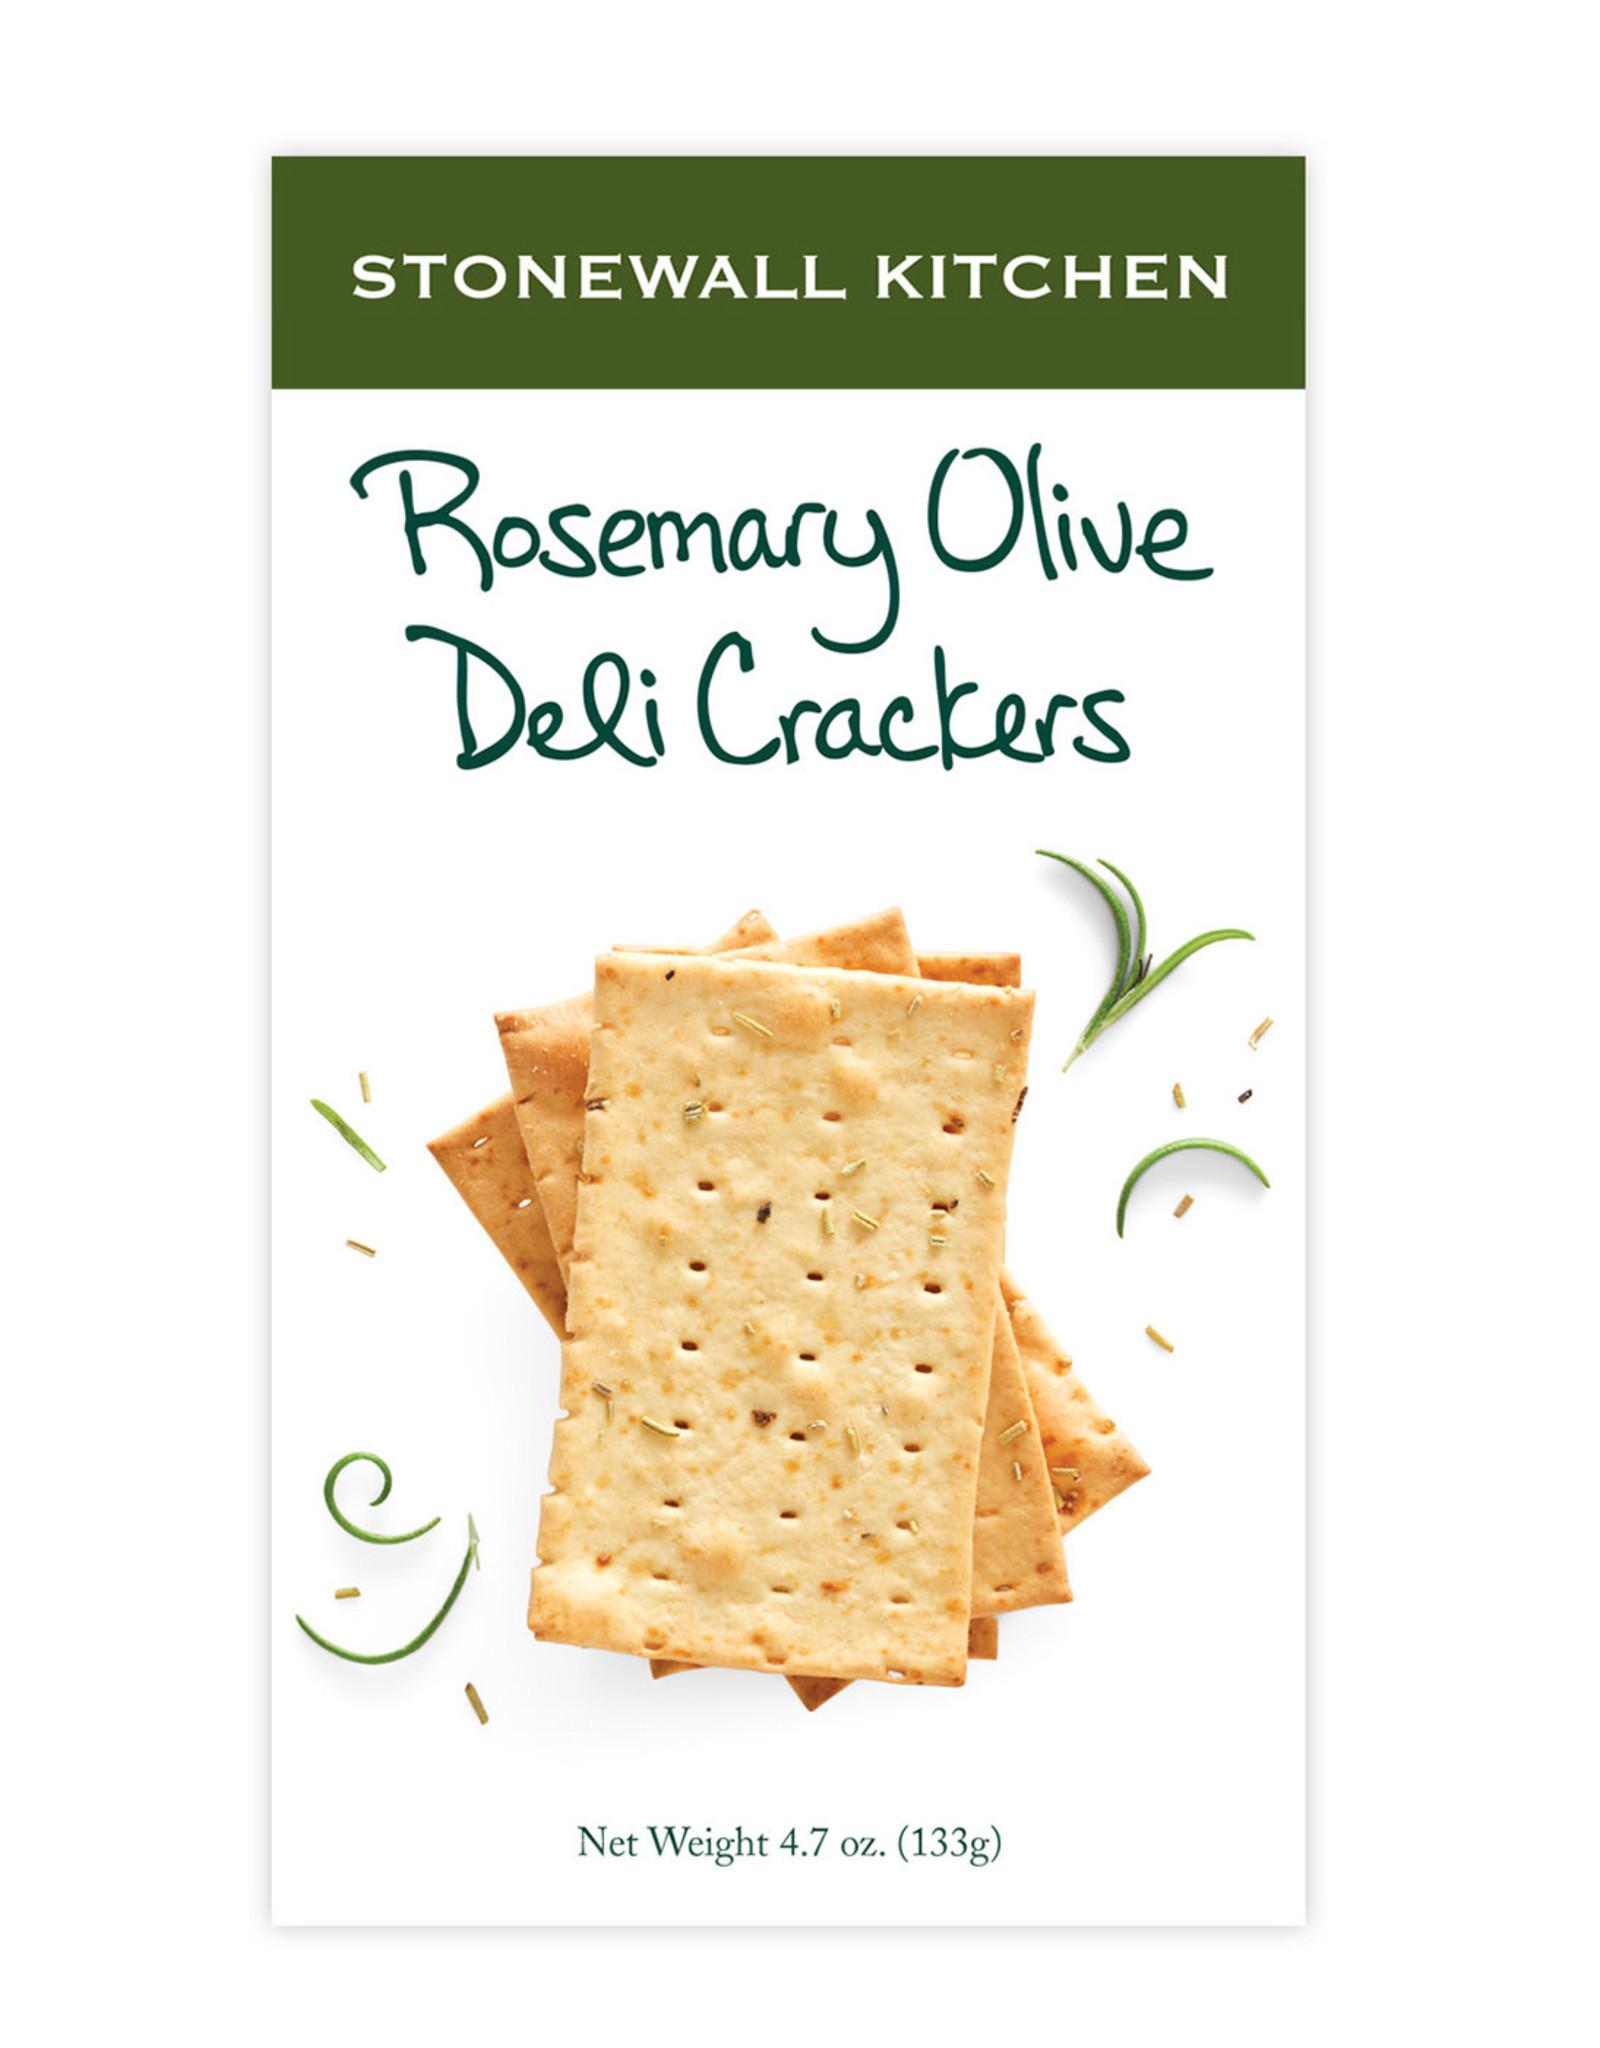 Stonewall Kitchen Rosemary Olive Deli Crackers